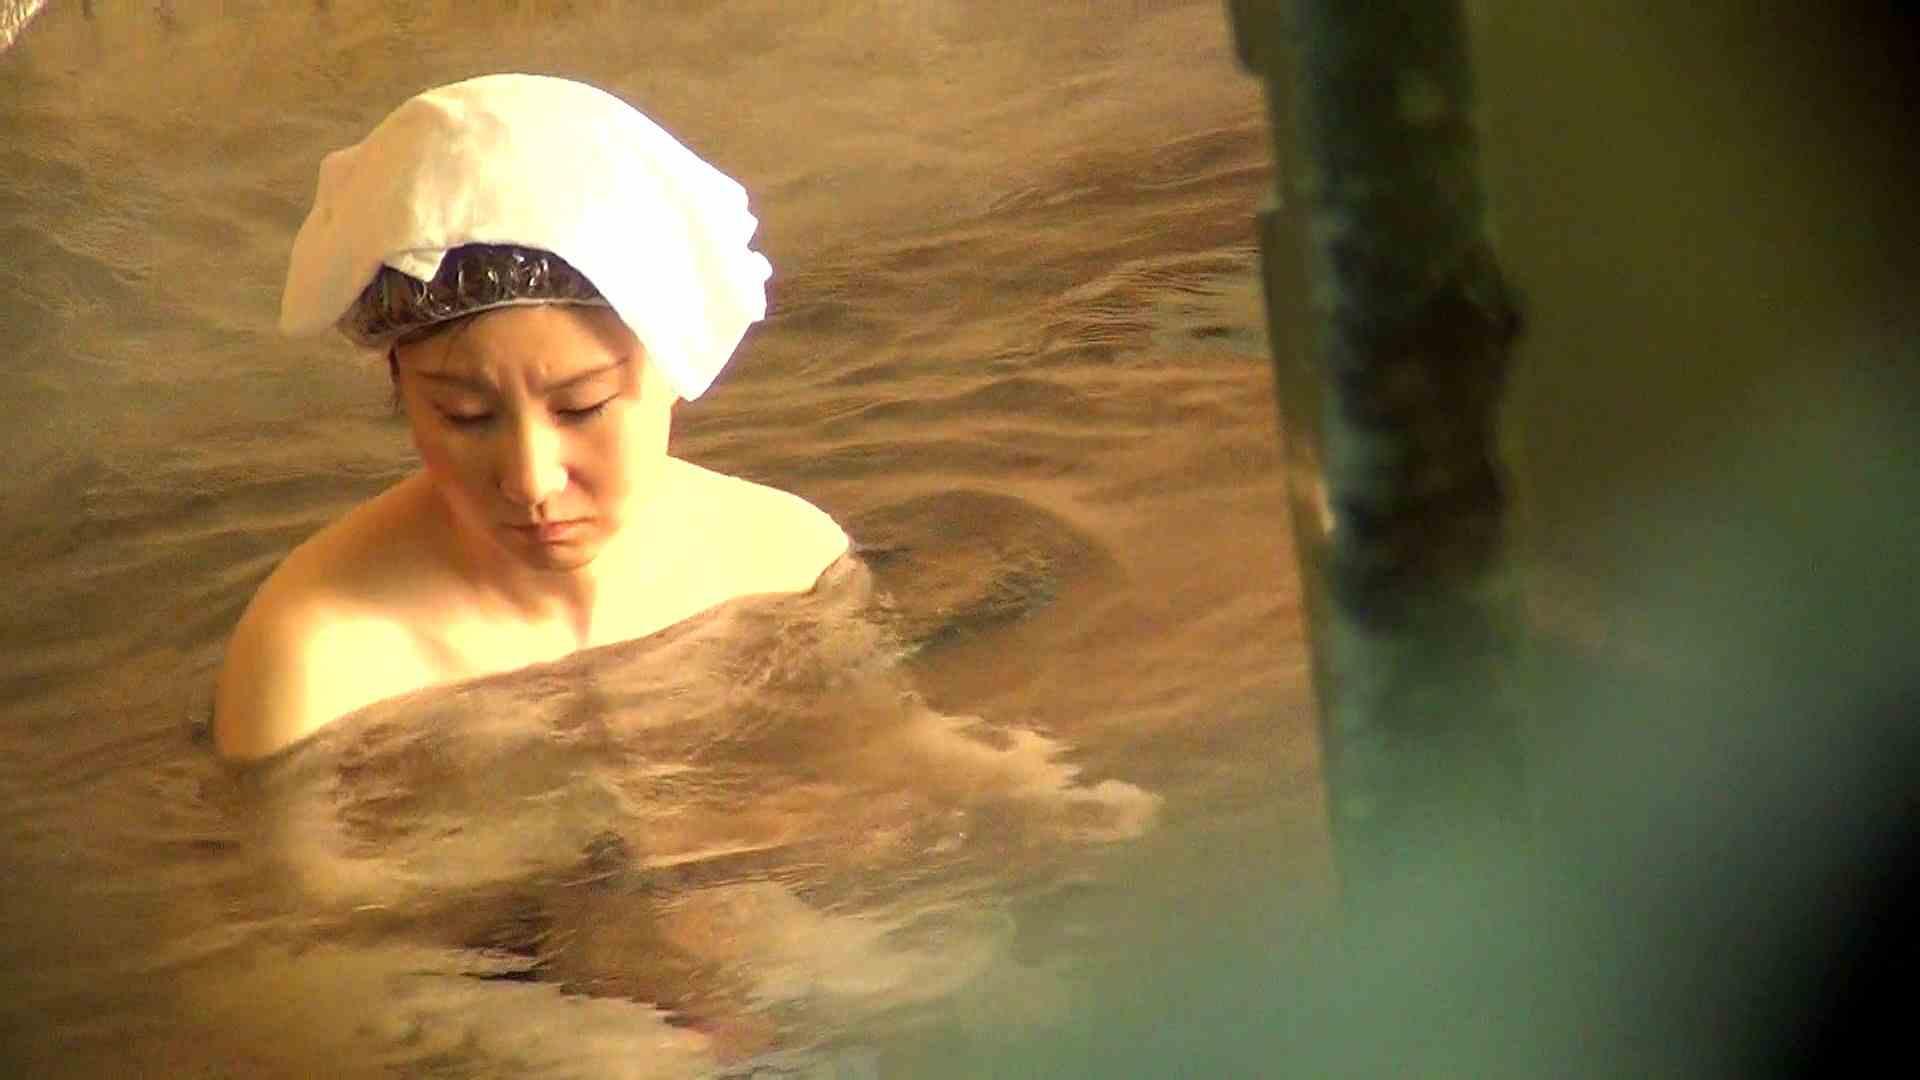 Aquaな露天風呂Vol.278 OLセックス 覗きオメコ動画キャプチャ 100画像 86